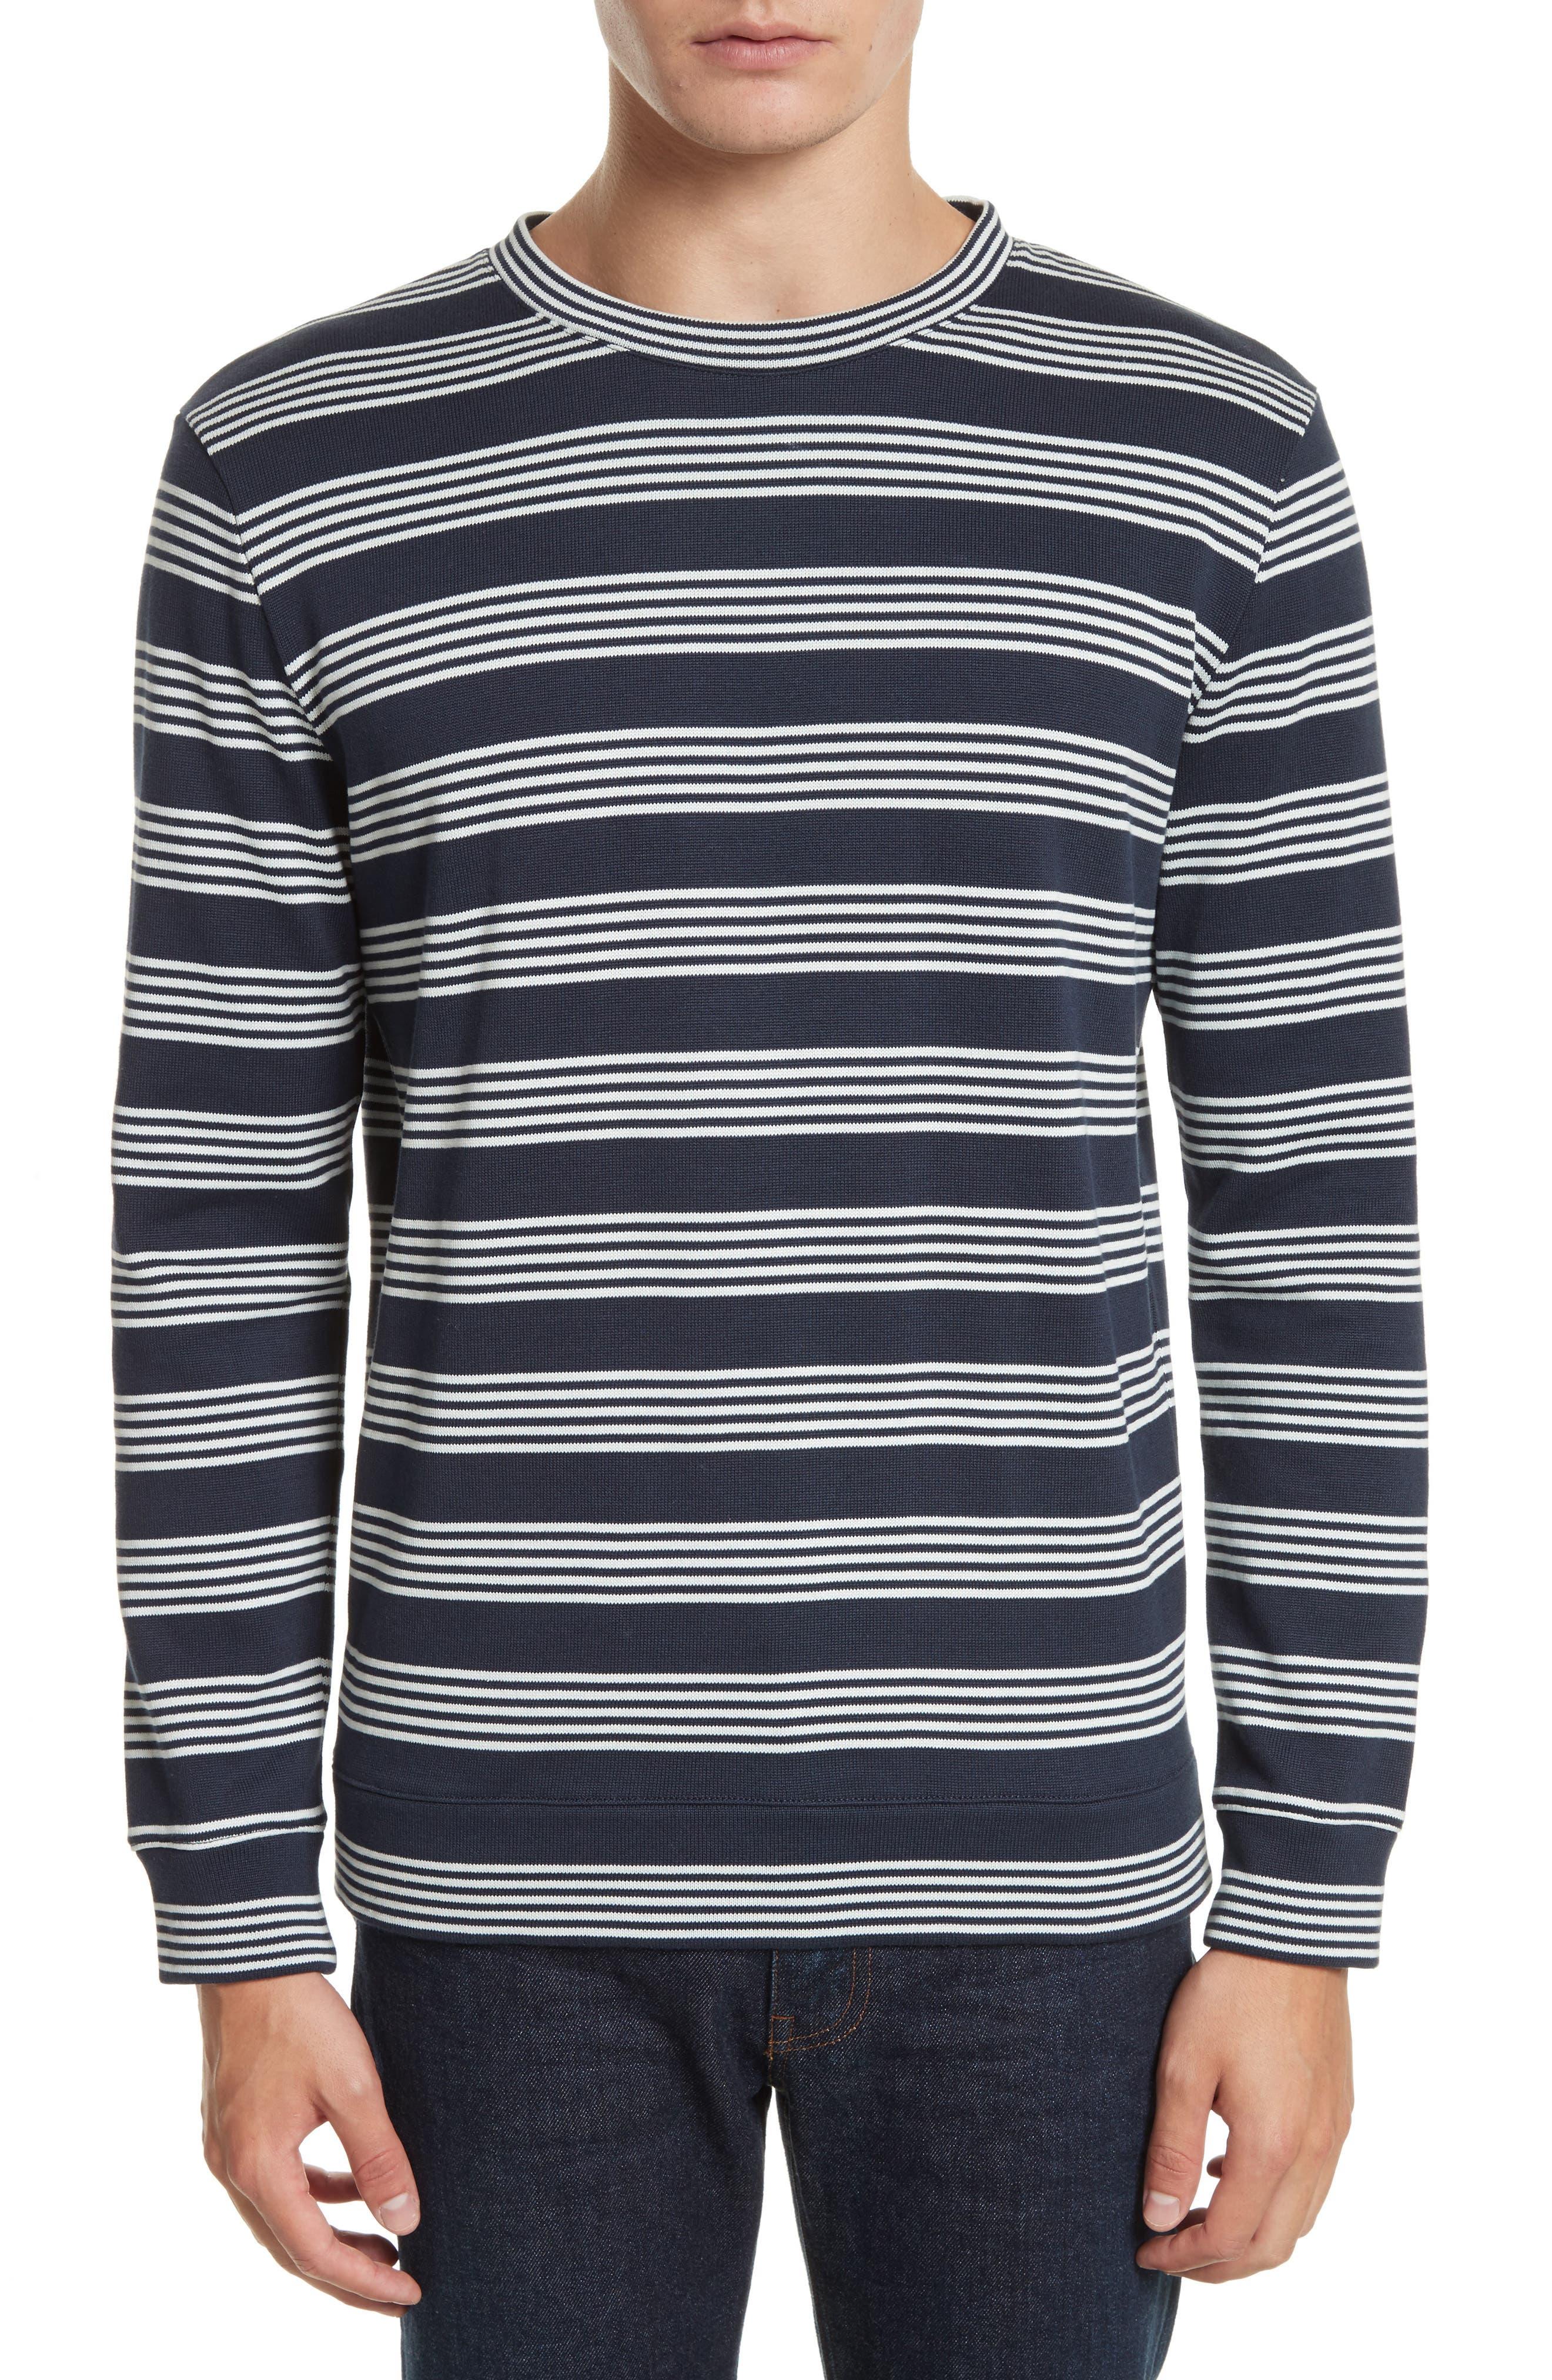 Stripe Sweat Jeremie Sweater,                             Main thumbnail 1, color,                             410